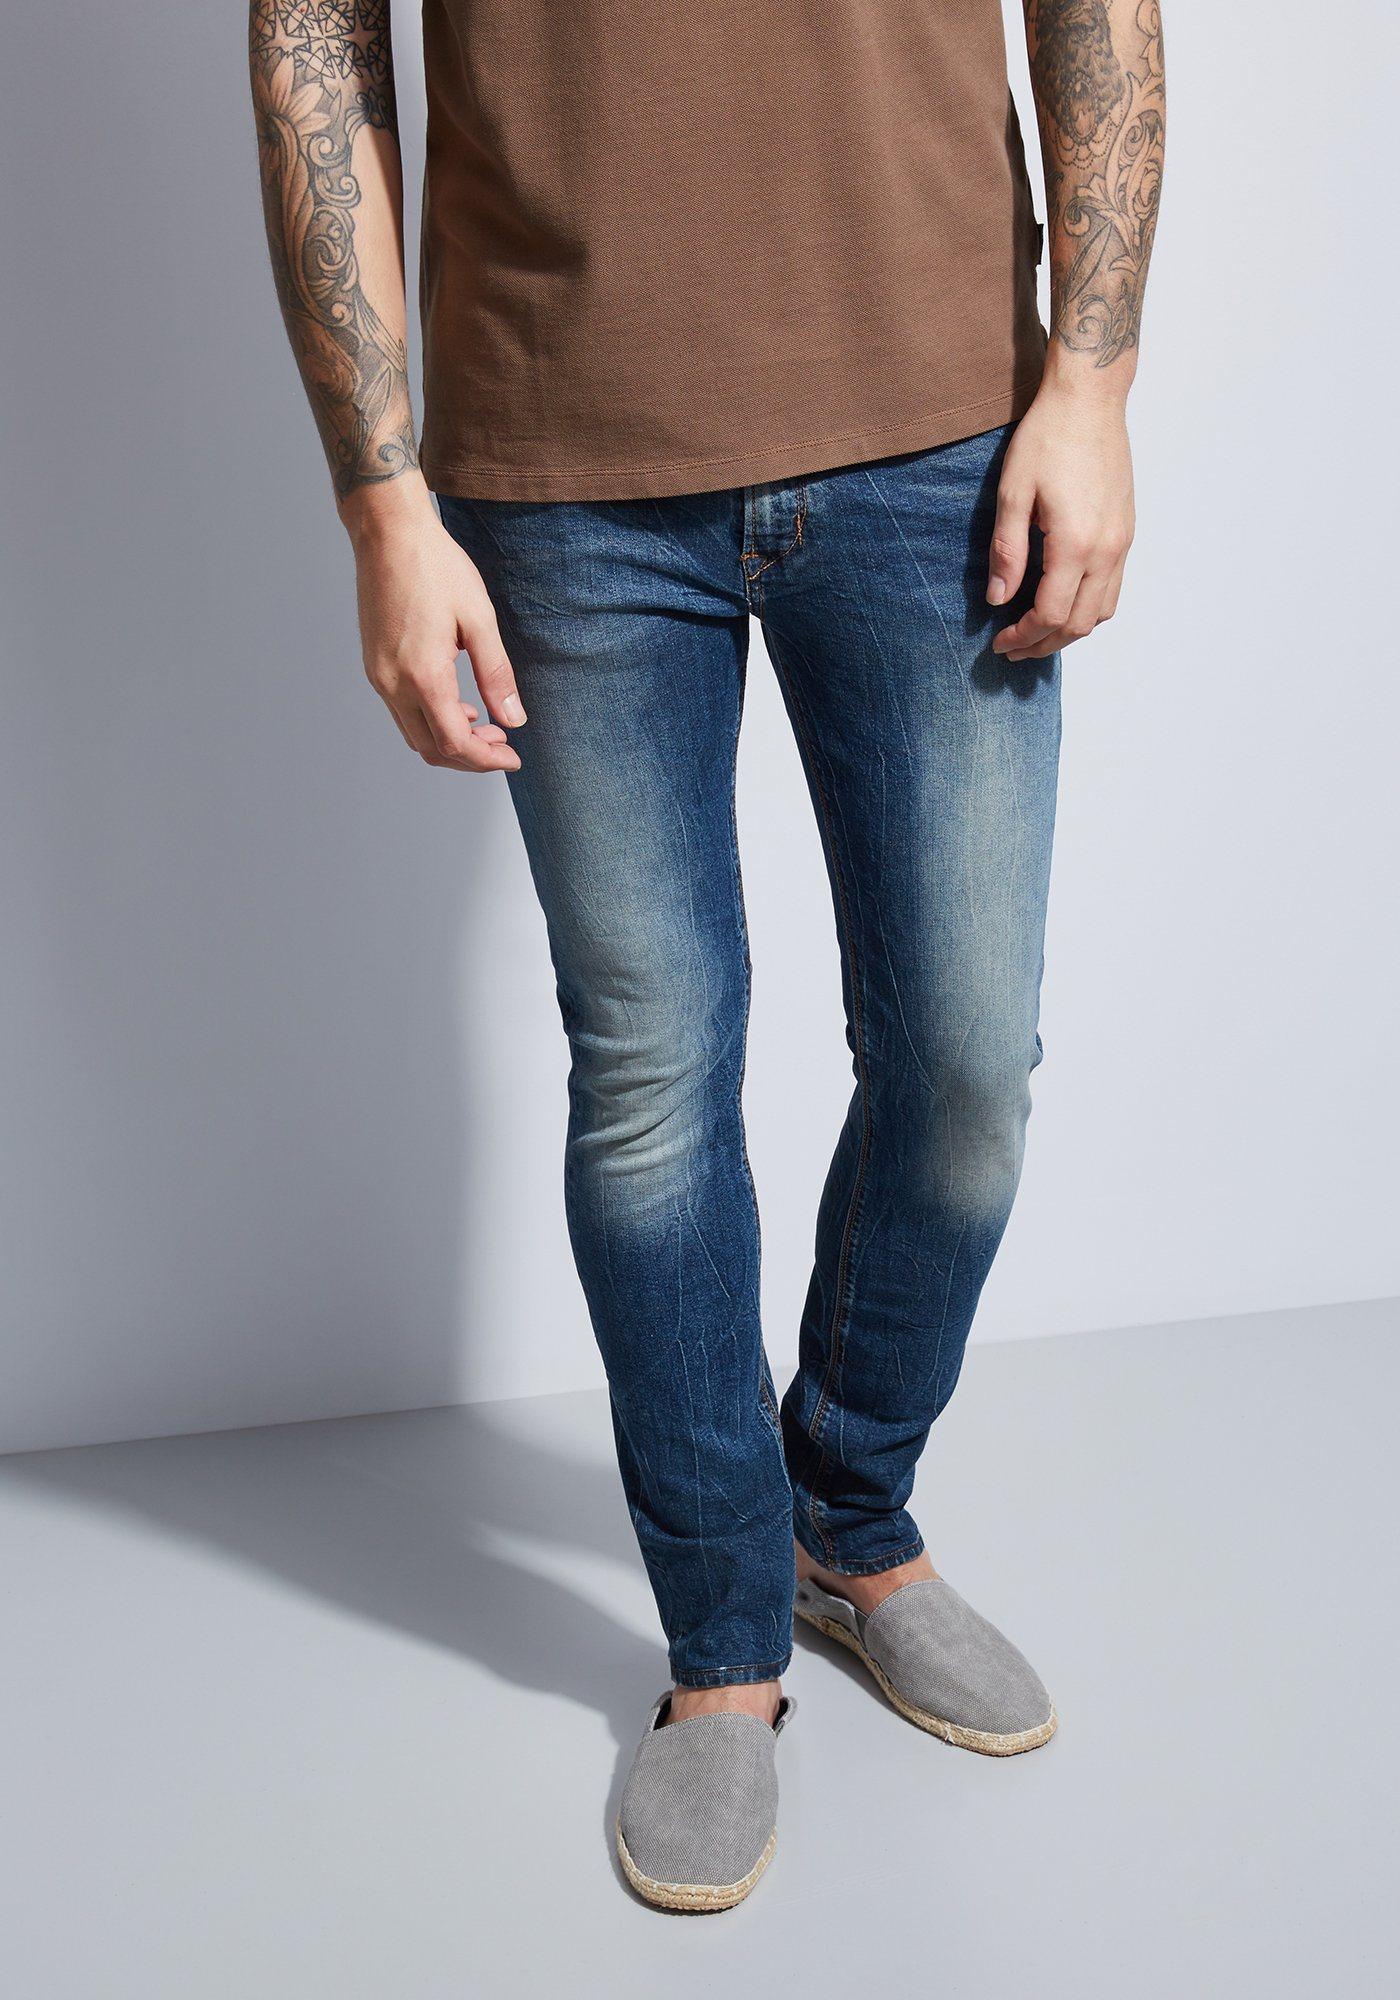 Otto Kern Pure Dynamic Stretch Jeans David - Slim Fit | Bekleidung > Jeans > Stretch Jeans | Jeans - Elasthan - Baumwolle | Otto Kern